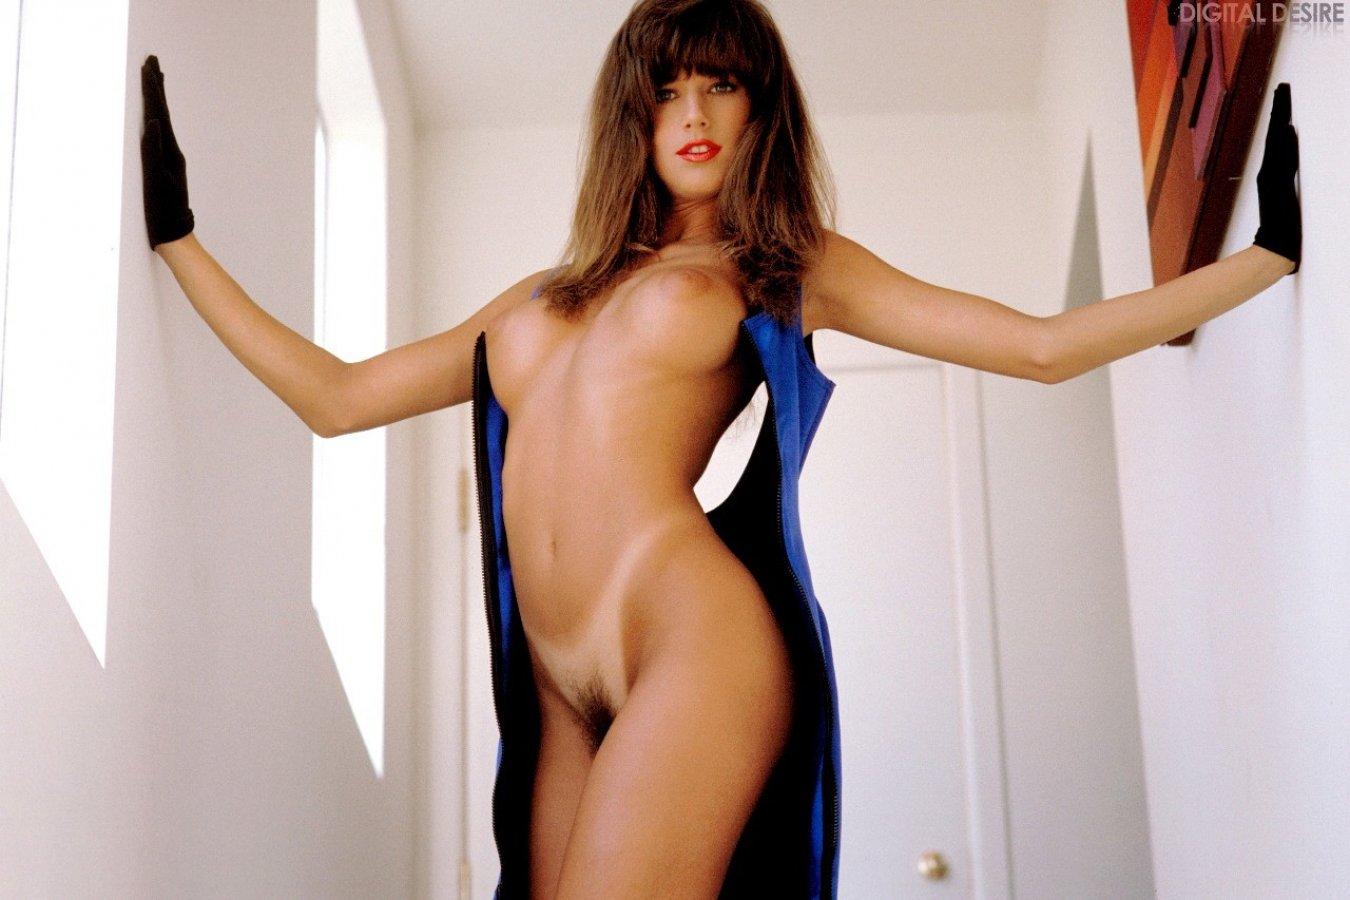 зрелые порно актрисы  zwezdrusexorg